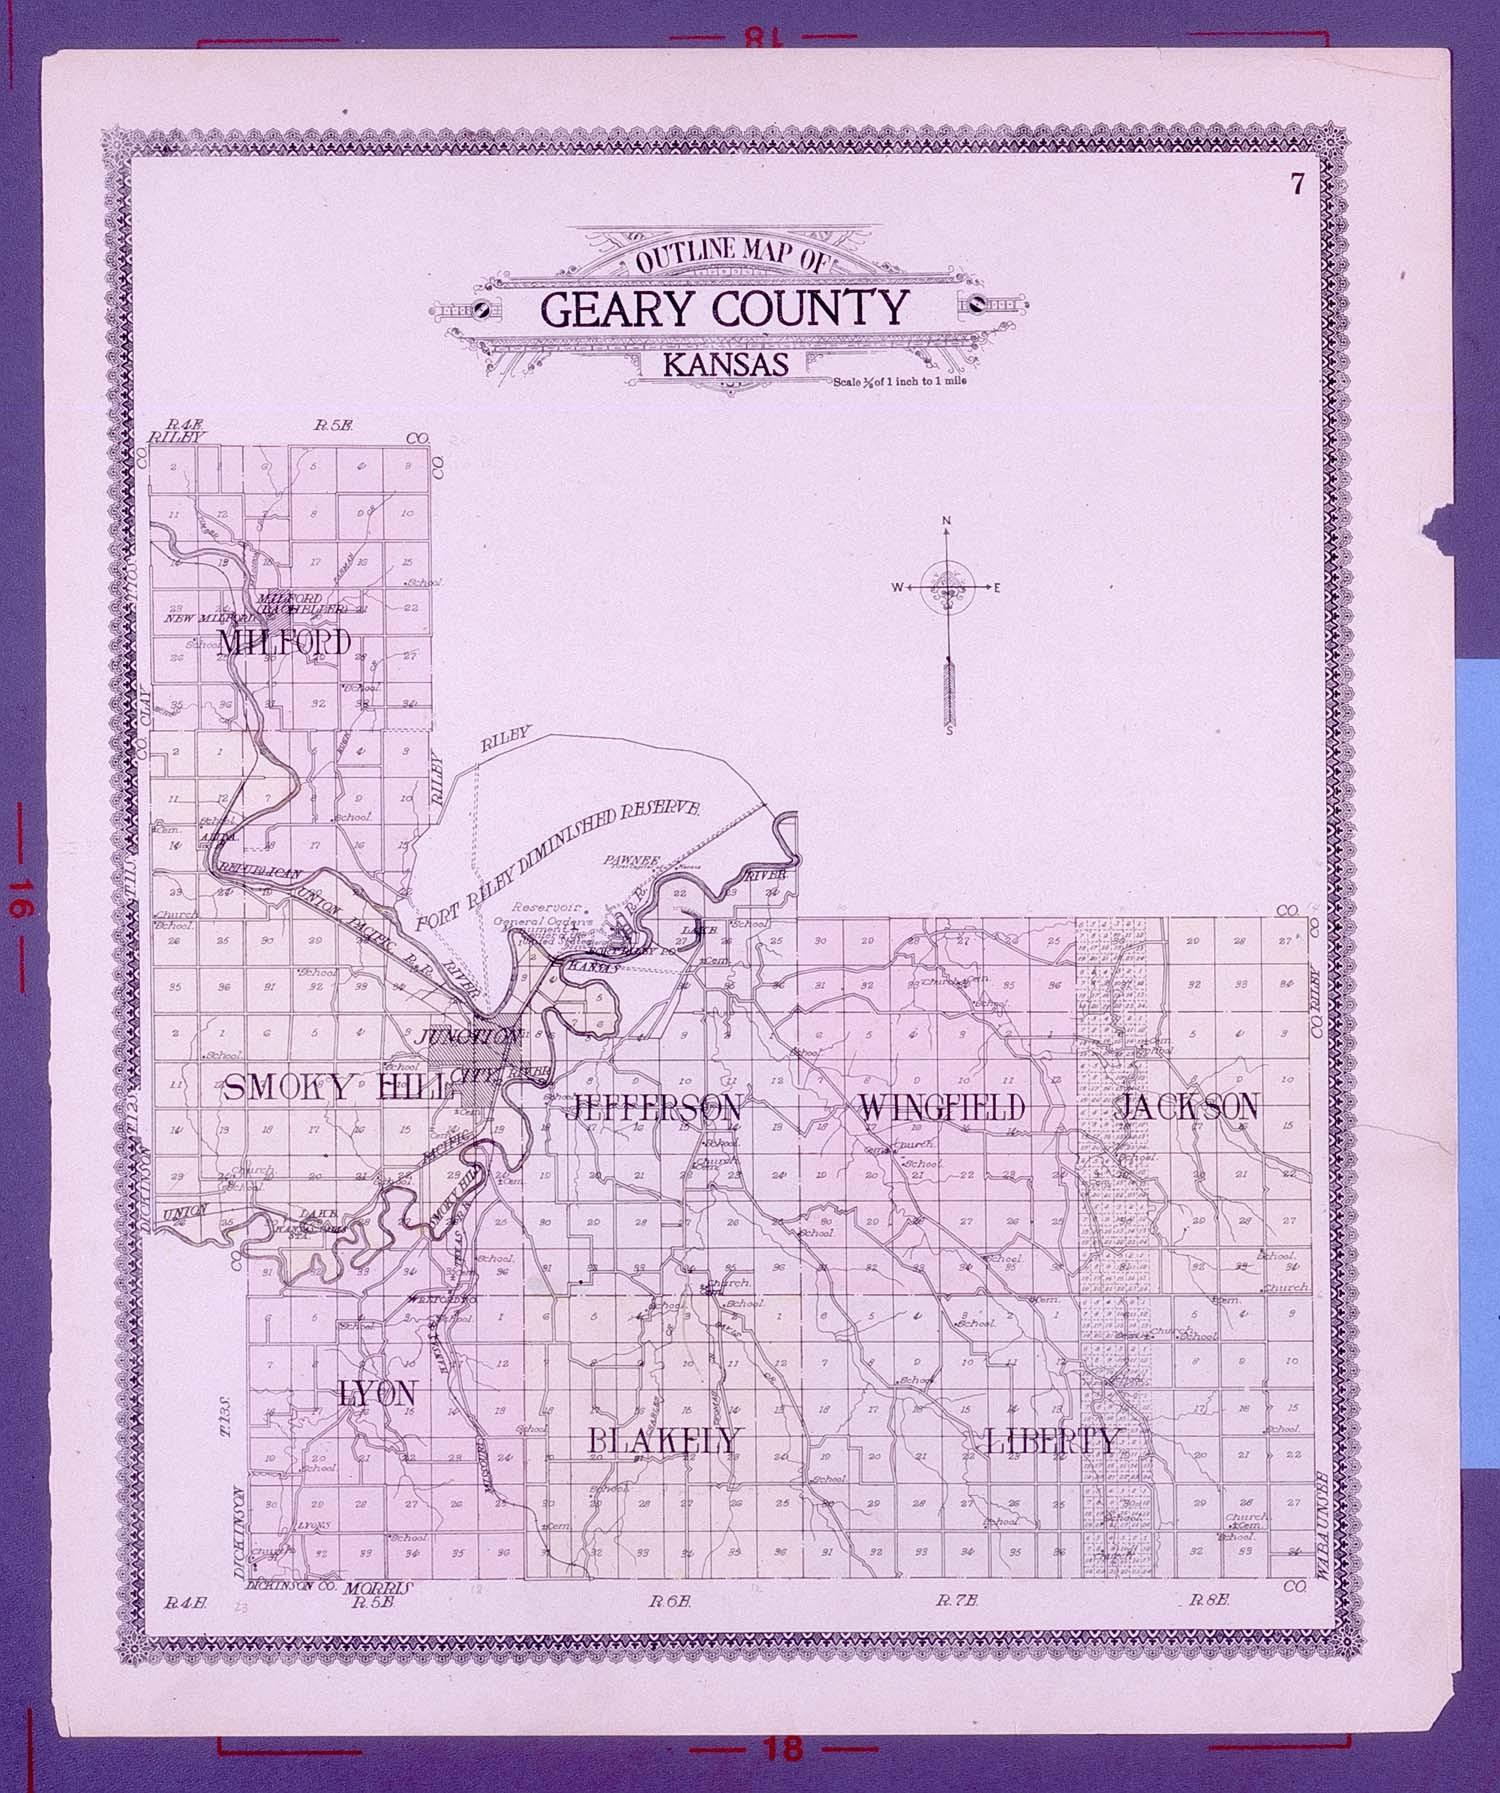 Standard atlas of Geary County, Kansas - 7